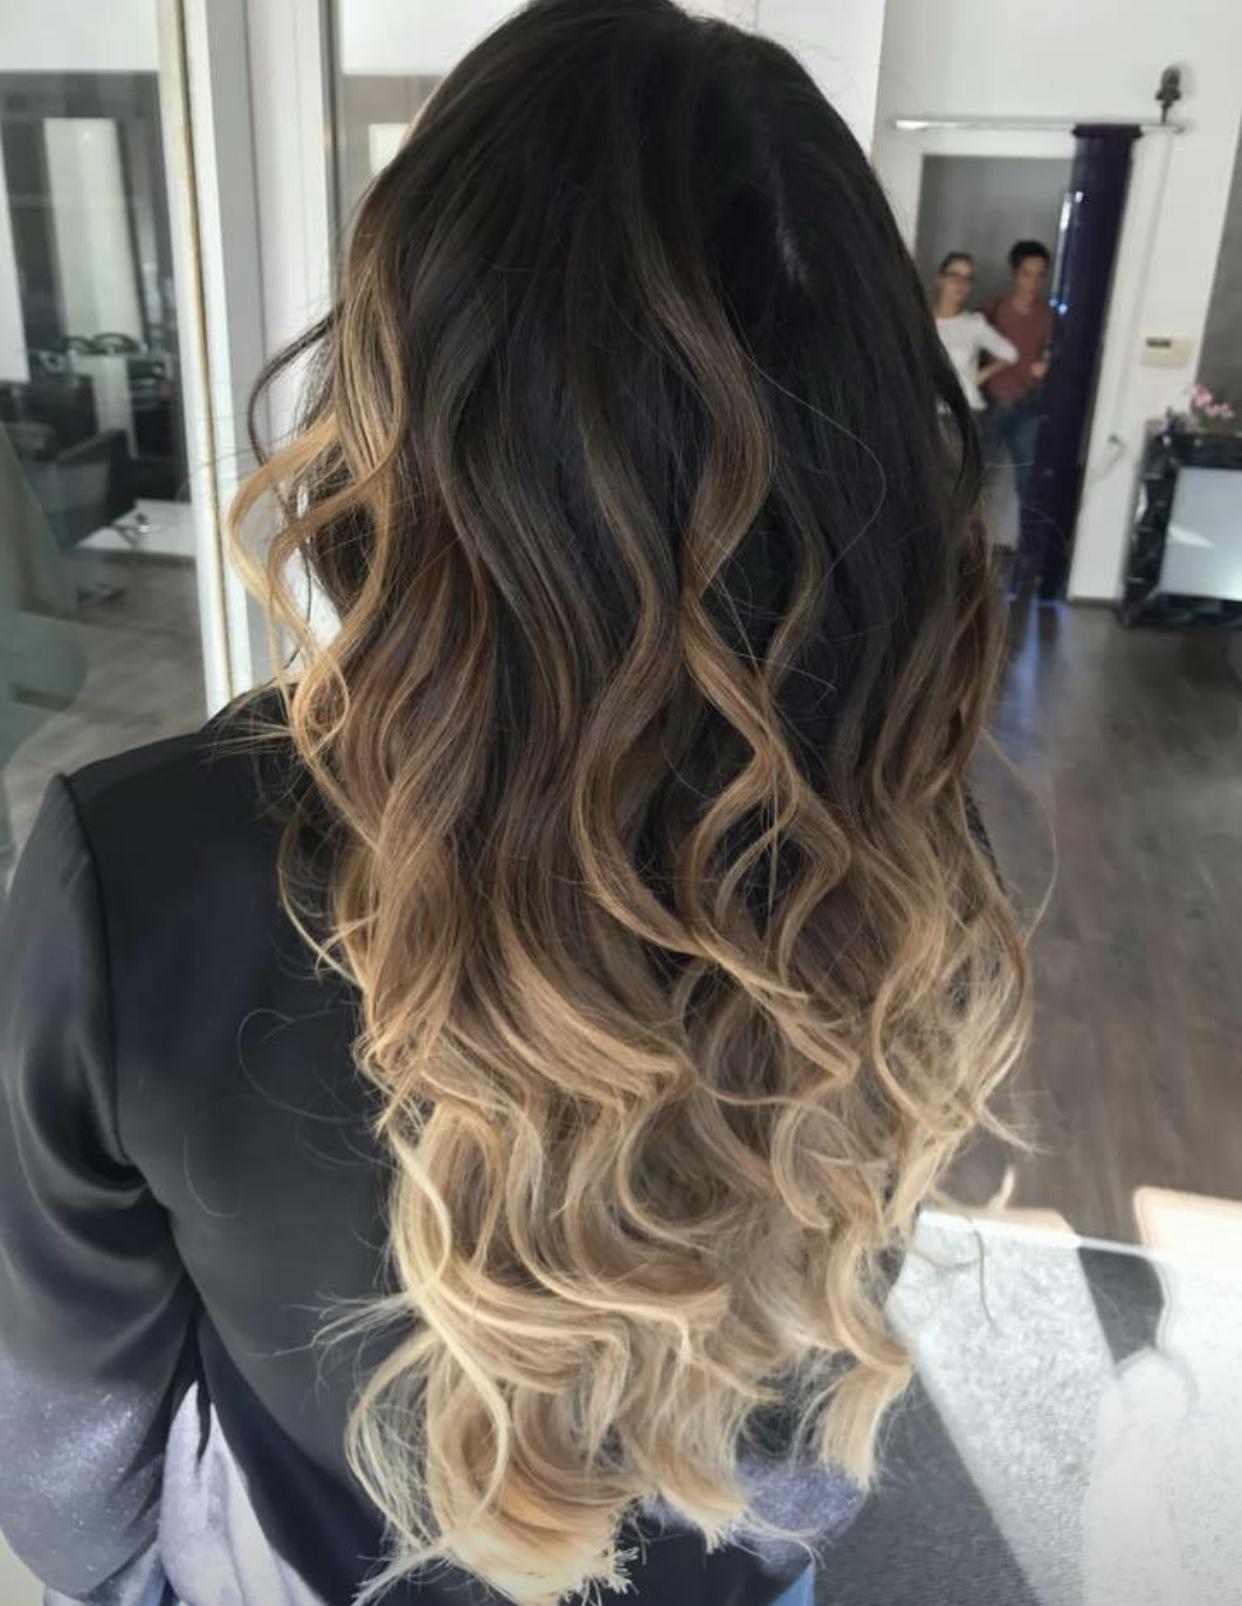 Wie Bekommt Man Längere Haare